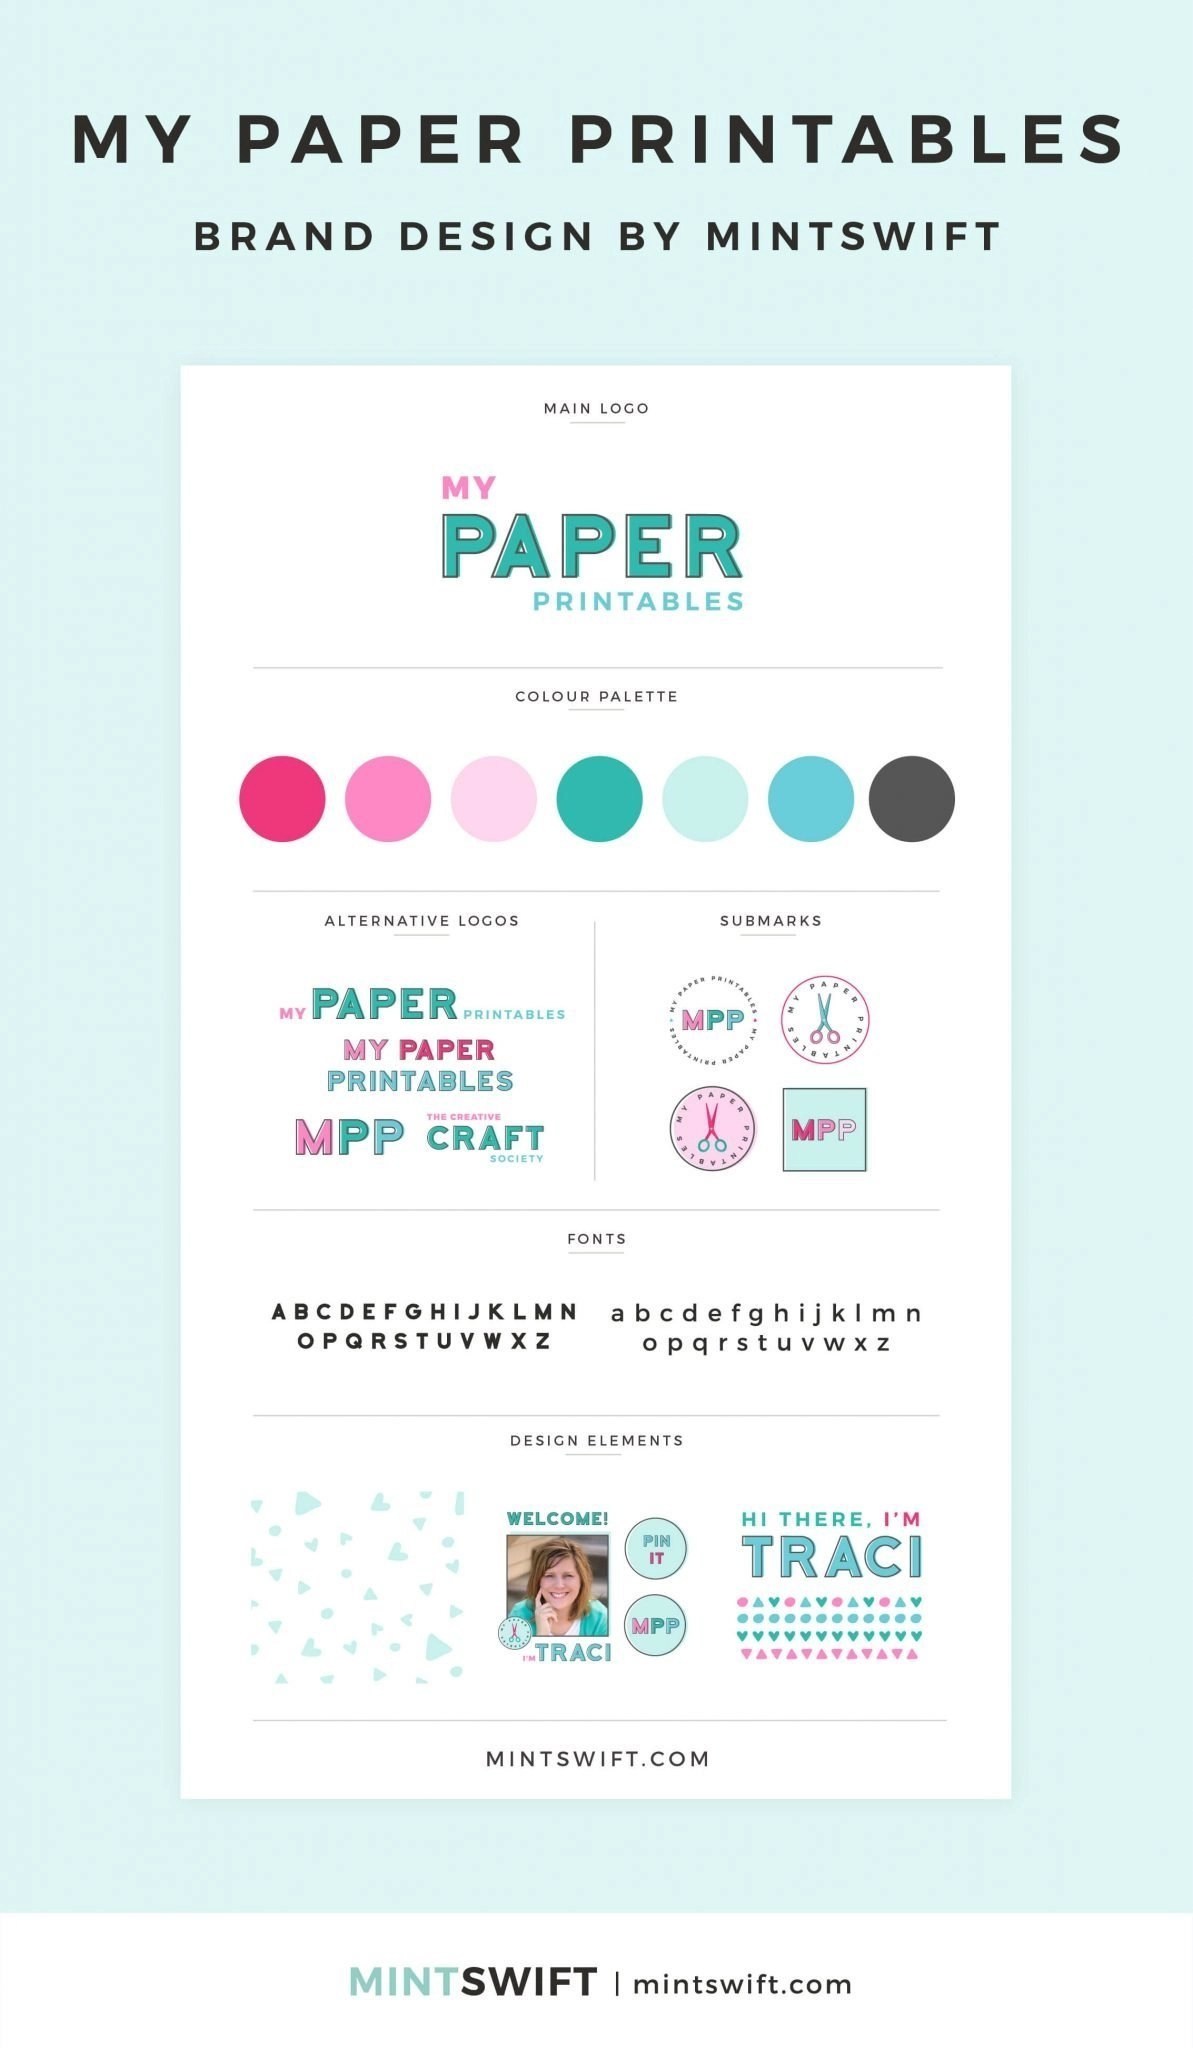 My Paper Printables - Brand Design - MintSwift - Adrianna Leszczynska